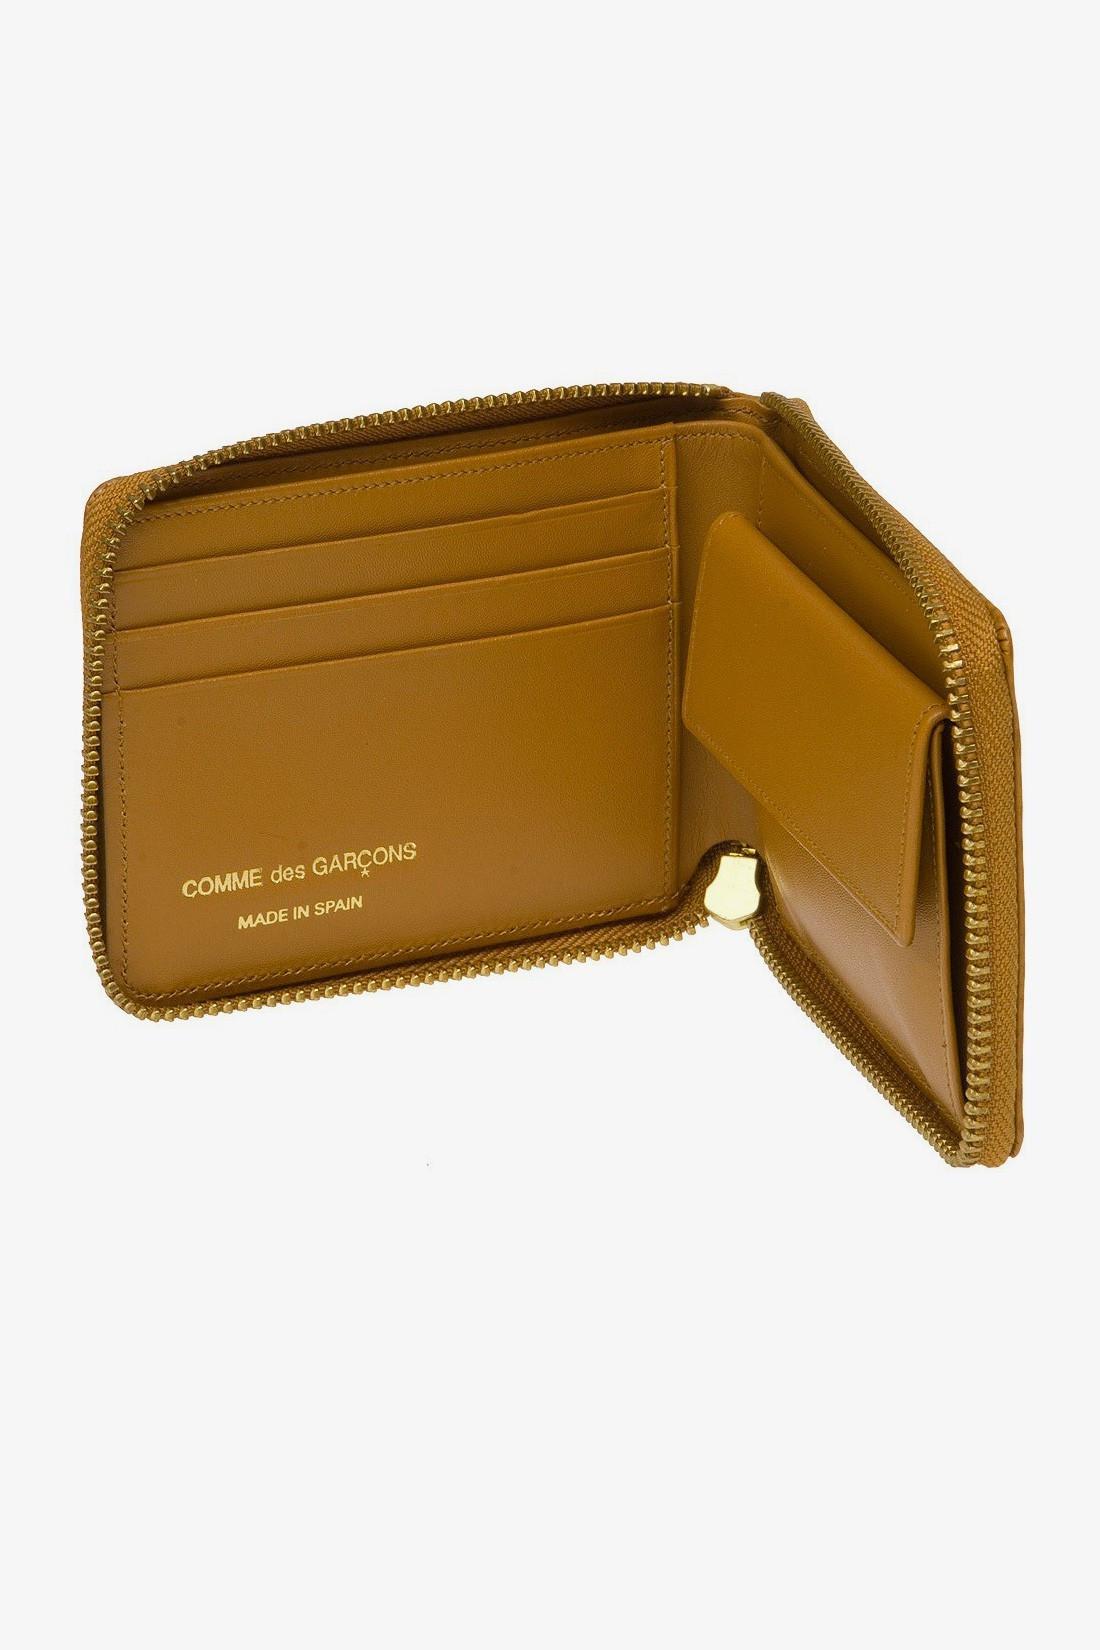 COMME DES GARÇONS WALLETS / Cdg luxury group sa7100lg Beige